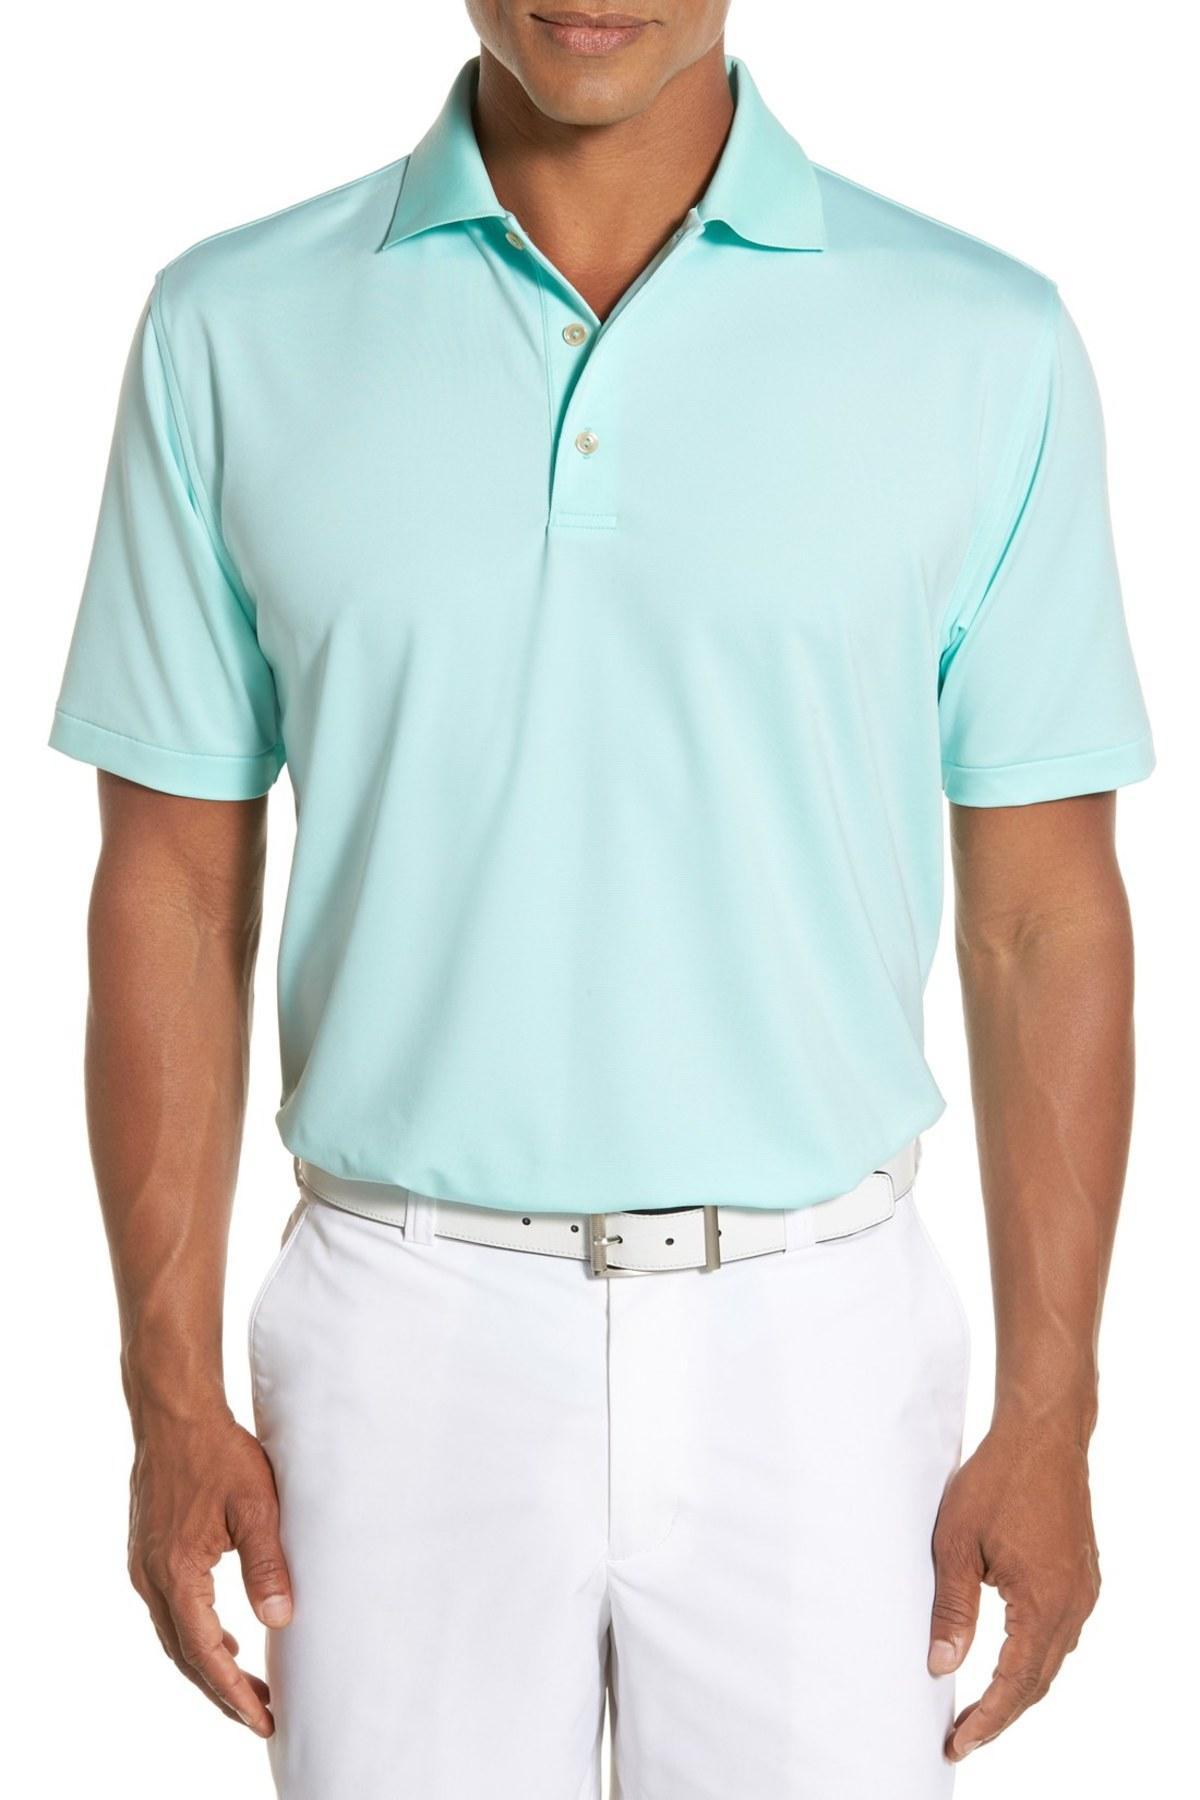 Peter millar nena stripe stretch microfiber golf polo in for Peter millar golf shirts